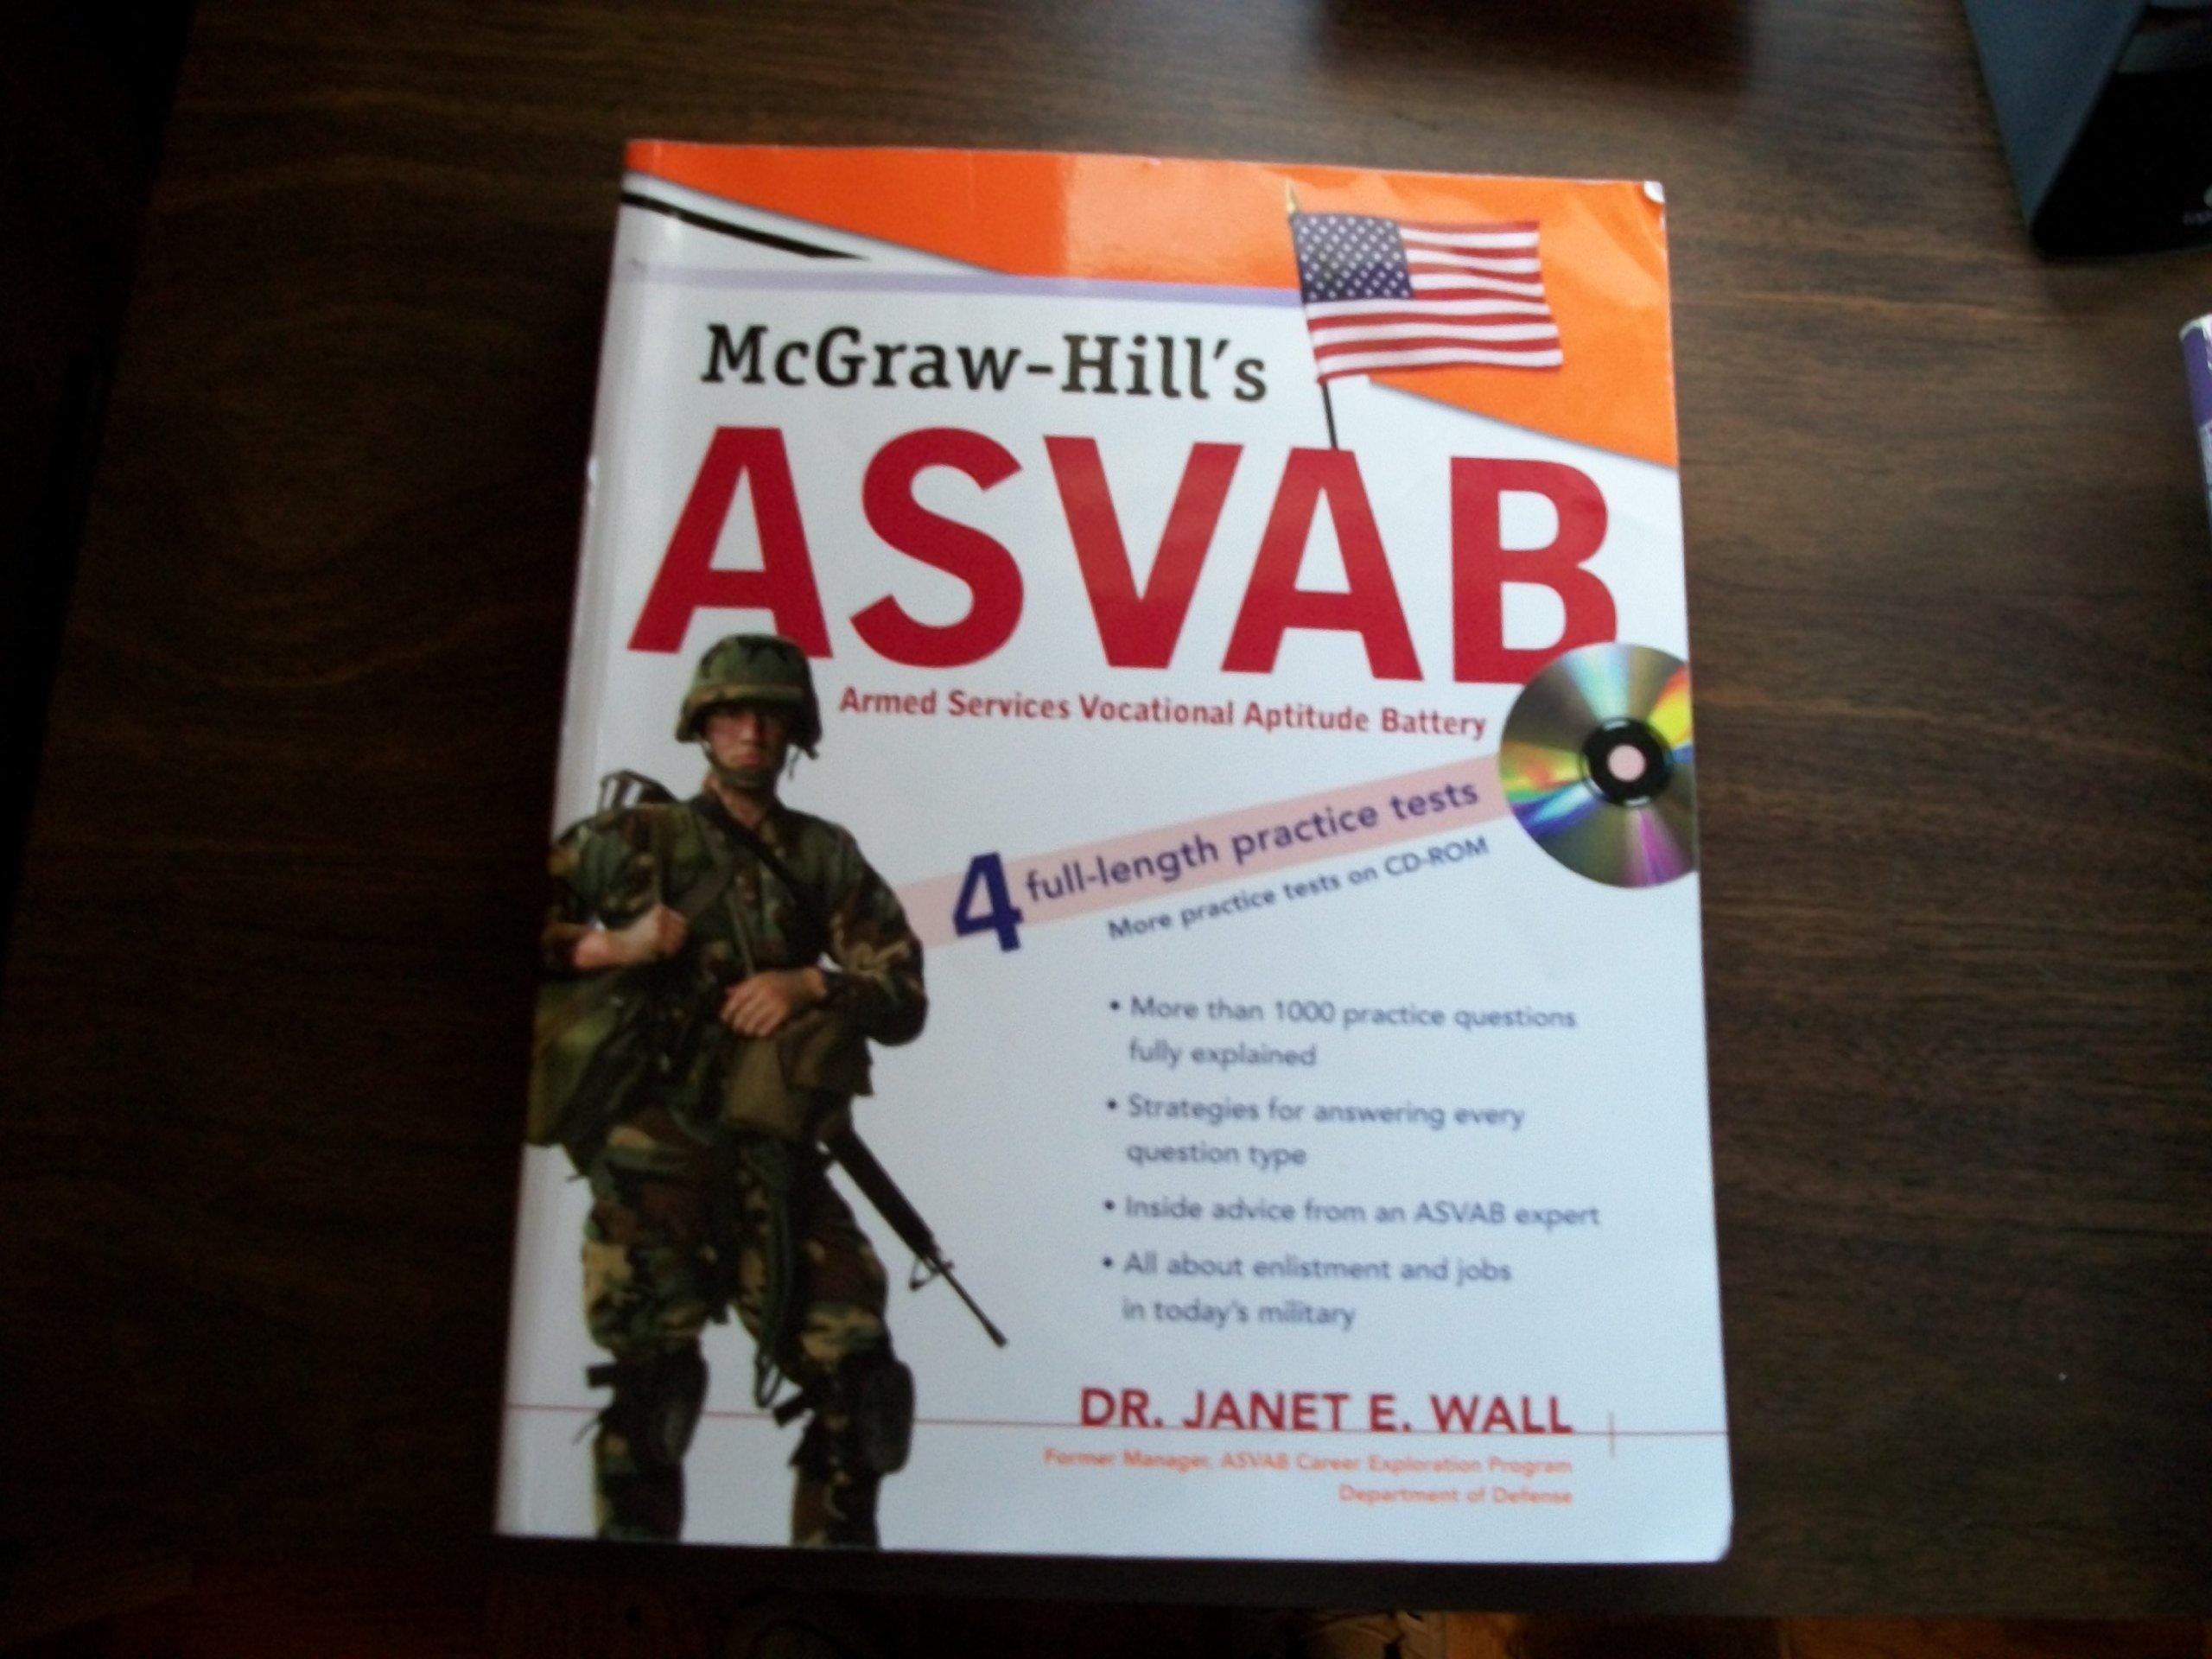 McGraw-Hill's ASVAB 4 Full-Length Practice Tests